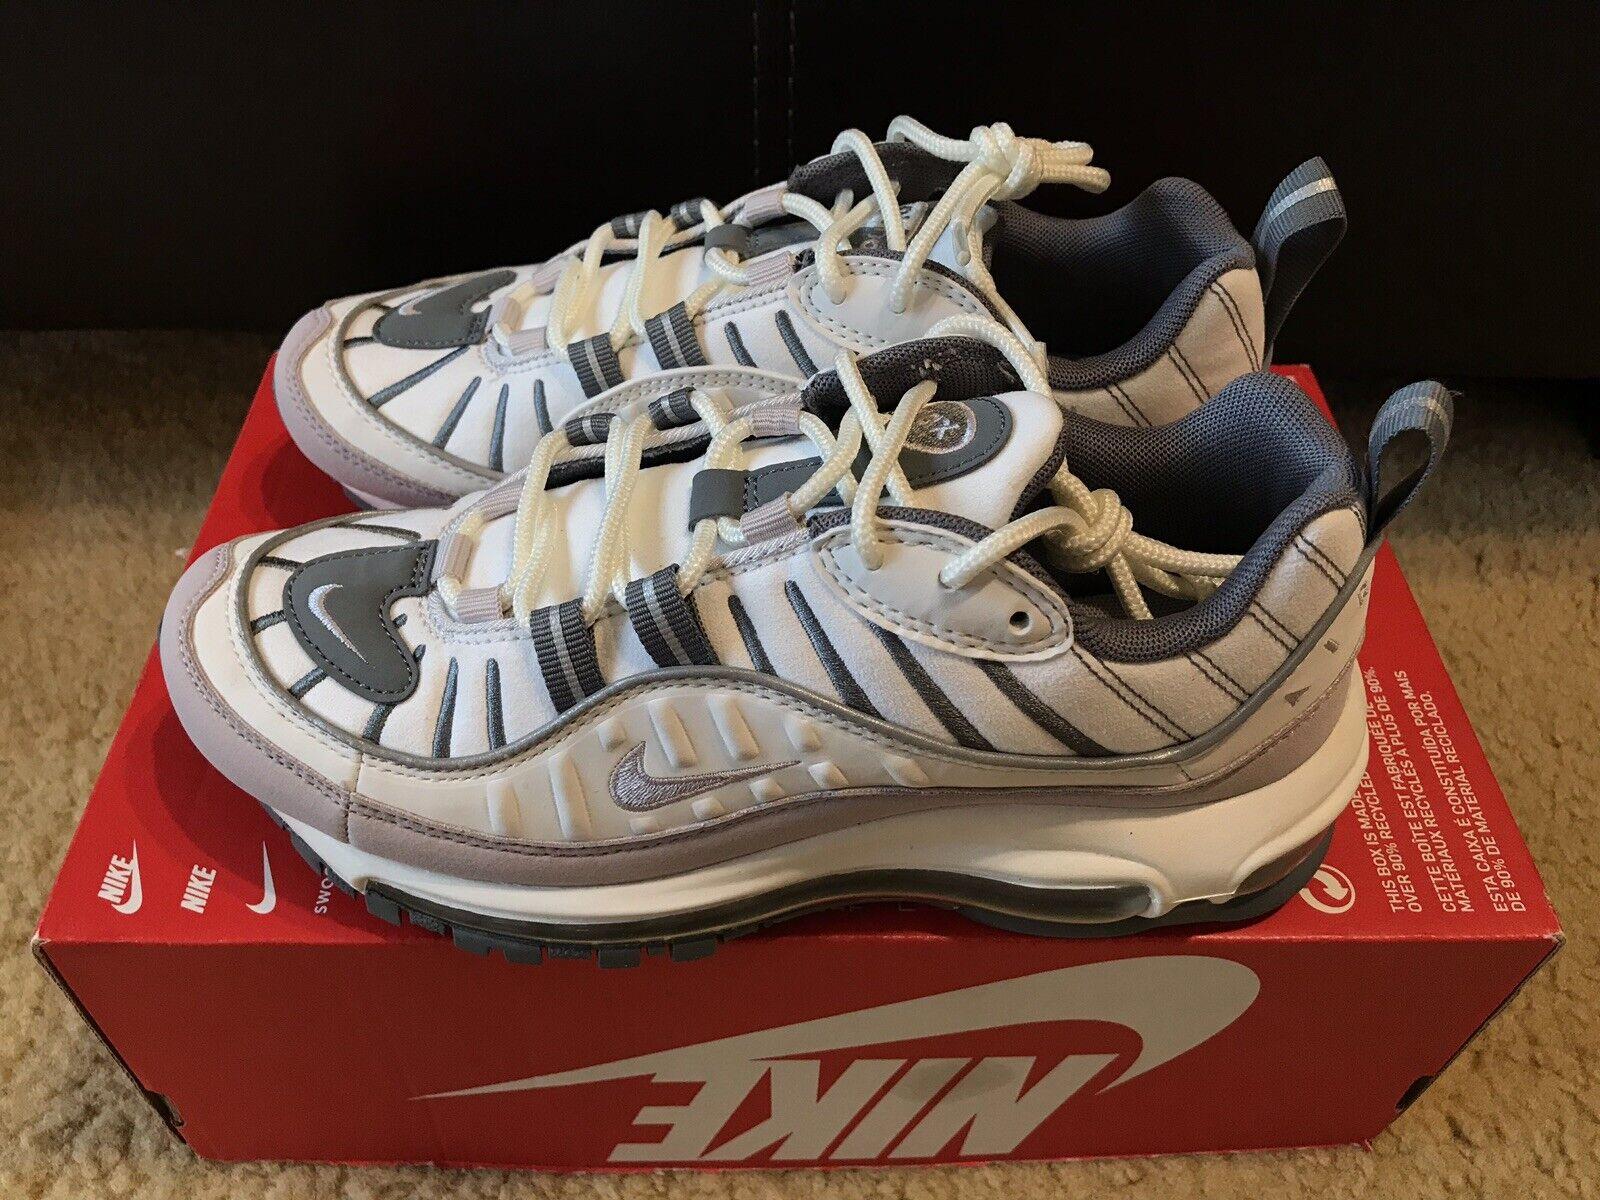 Nike Air Max 98 Women S Size 6 Summit White Violet Ash Ah6799 111